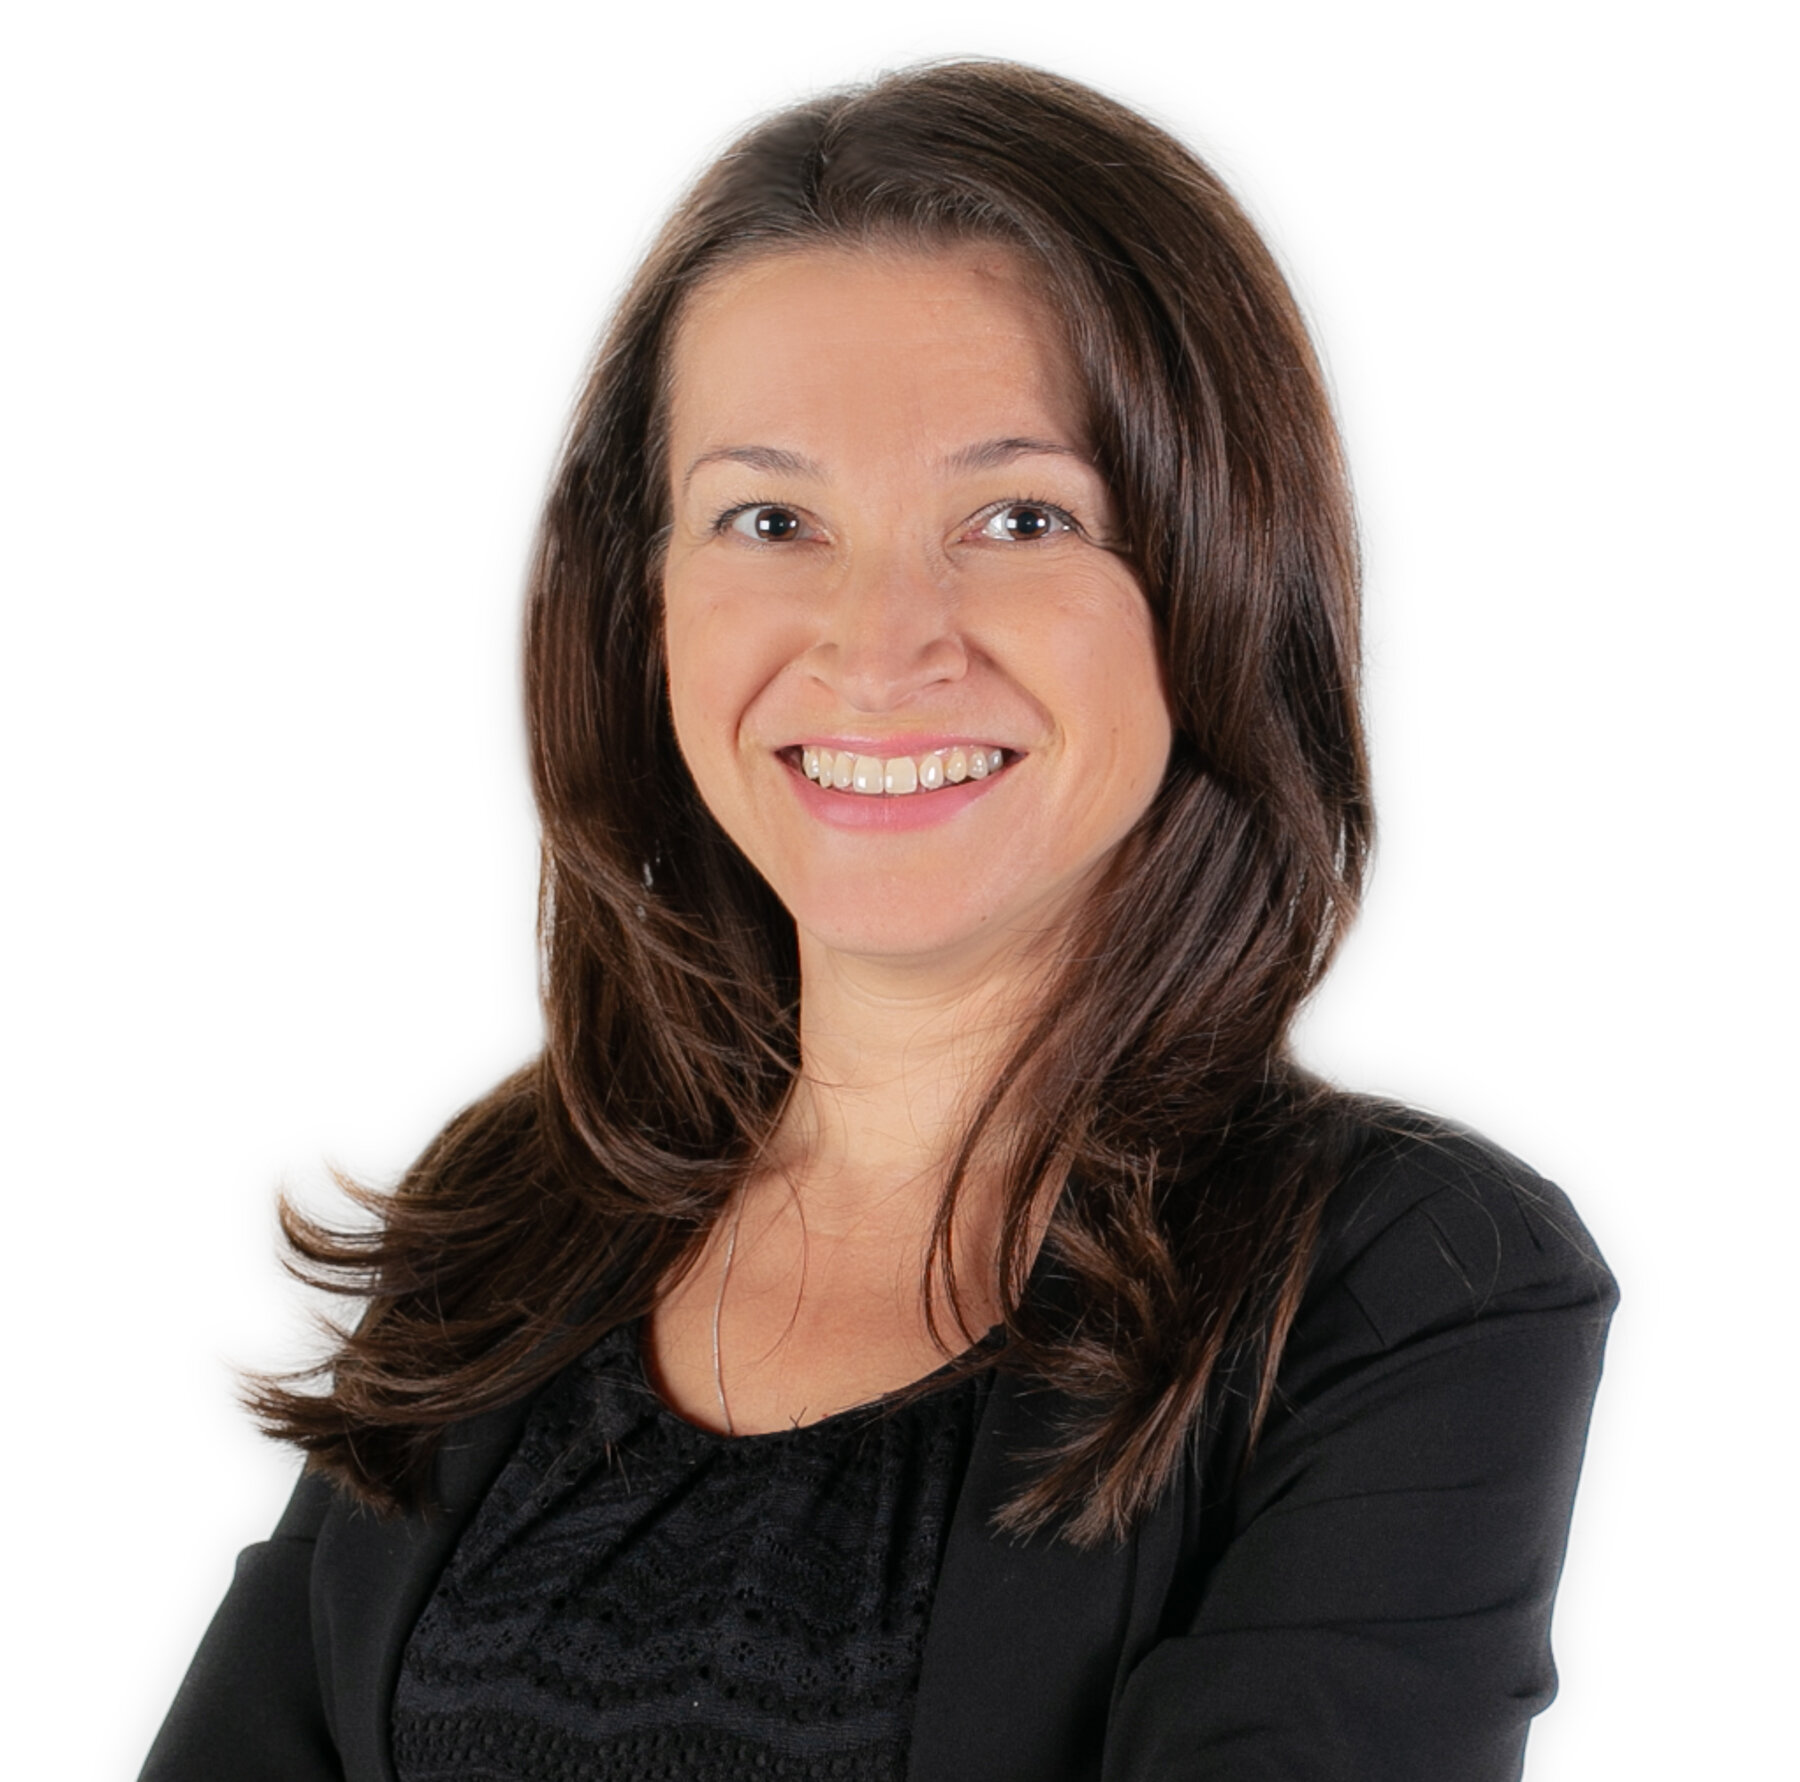 Christina Gellos, HR Consultant at LD Human Resources